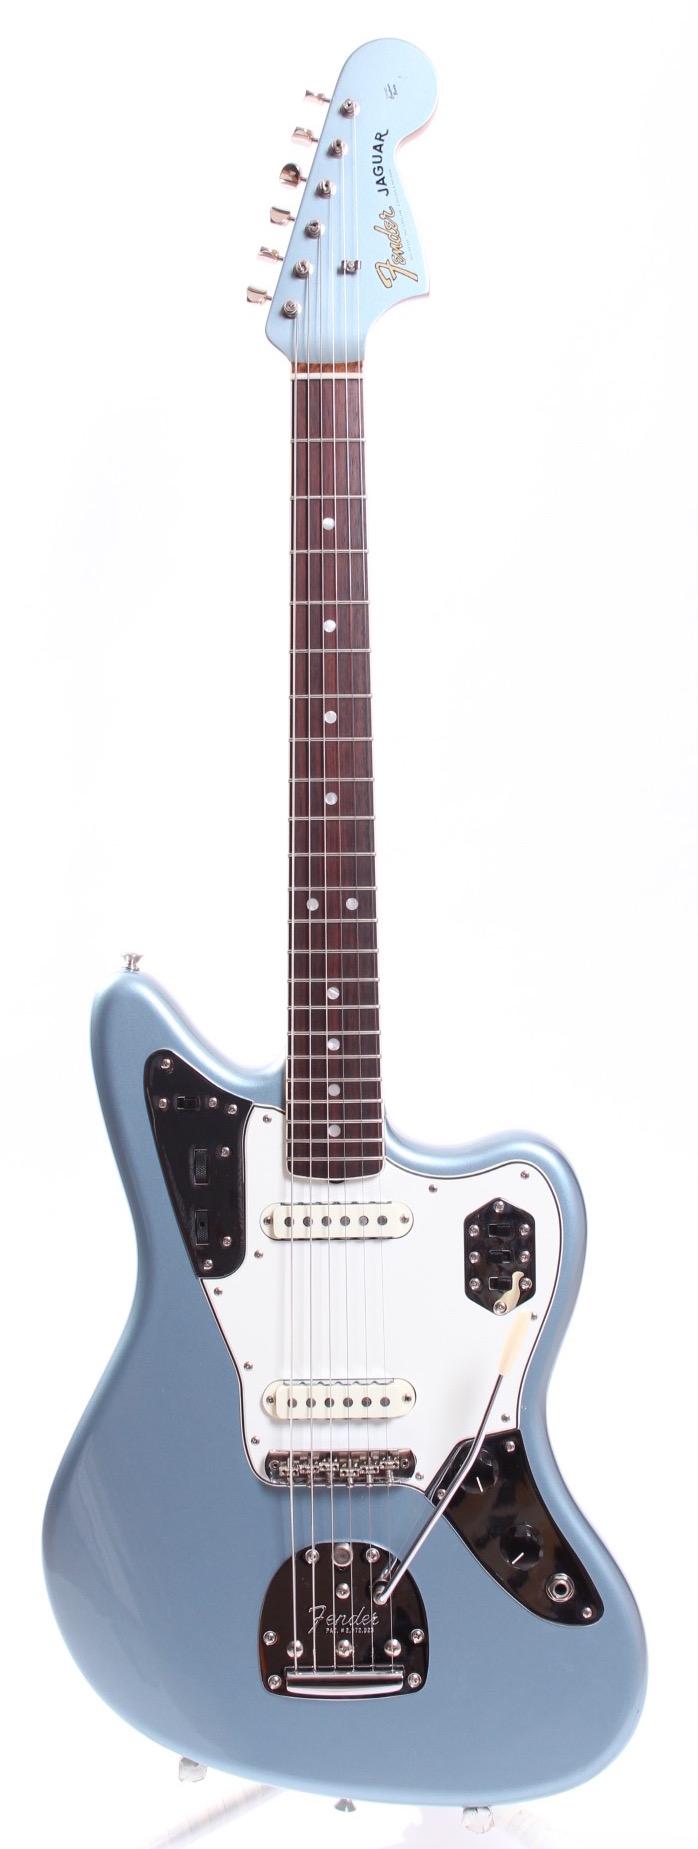 fender jaguar american vintage 39 65 reissue 2013 ice blue metallic guitar for sale yeahman 39 s guitars. Black Bedroom Furniture Sets. Home Design Ideas